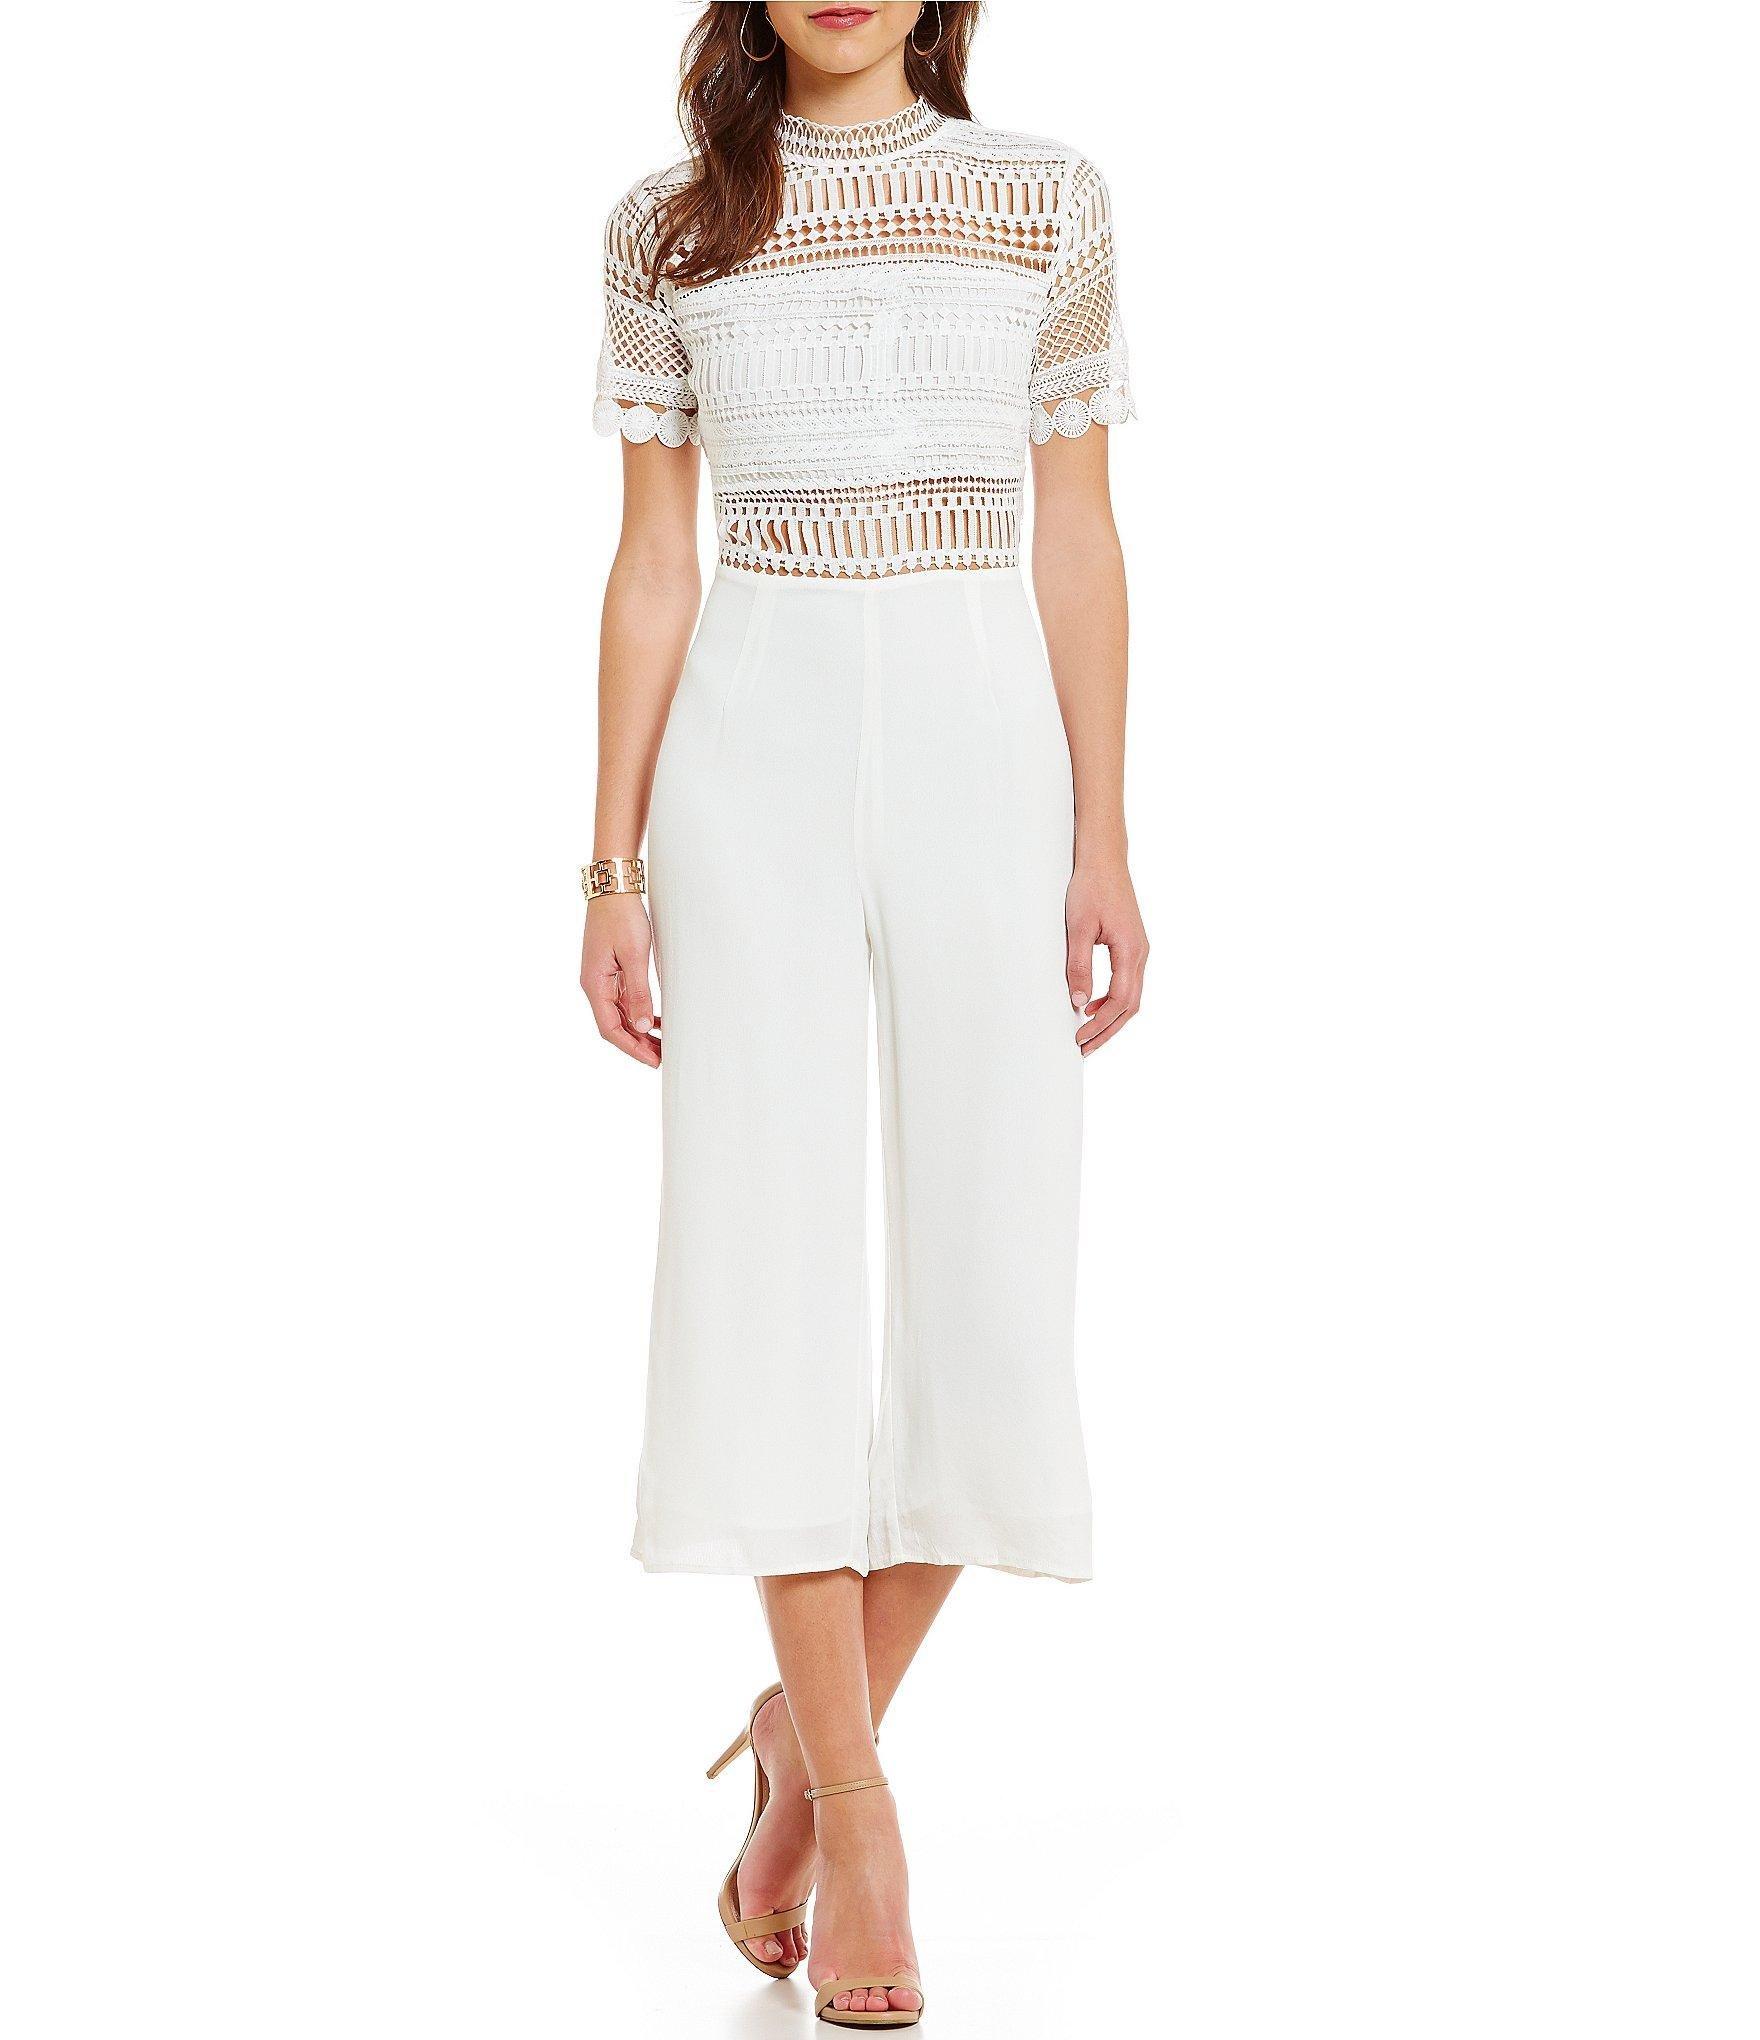 6118d857c044 Lyst - Blu Pepper Crochet Short-sleeve Jumpsuit in White